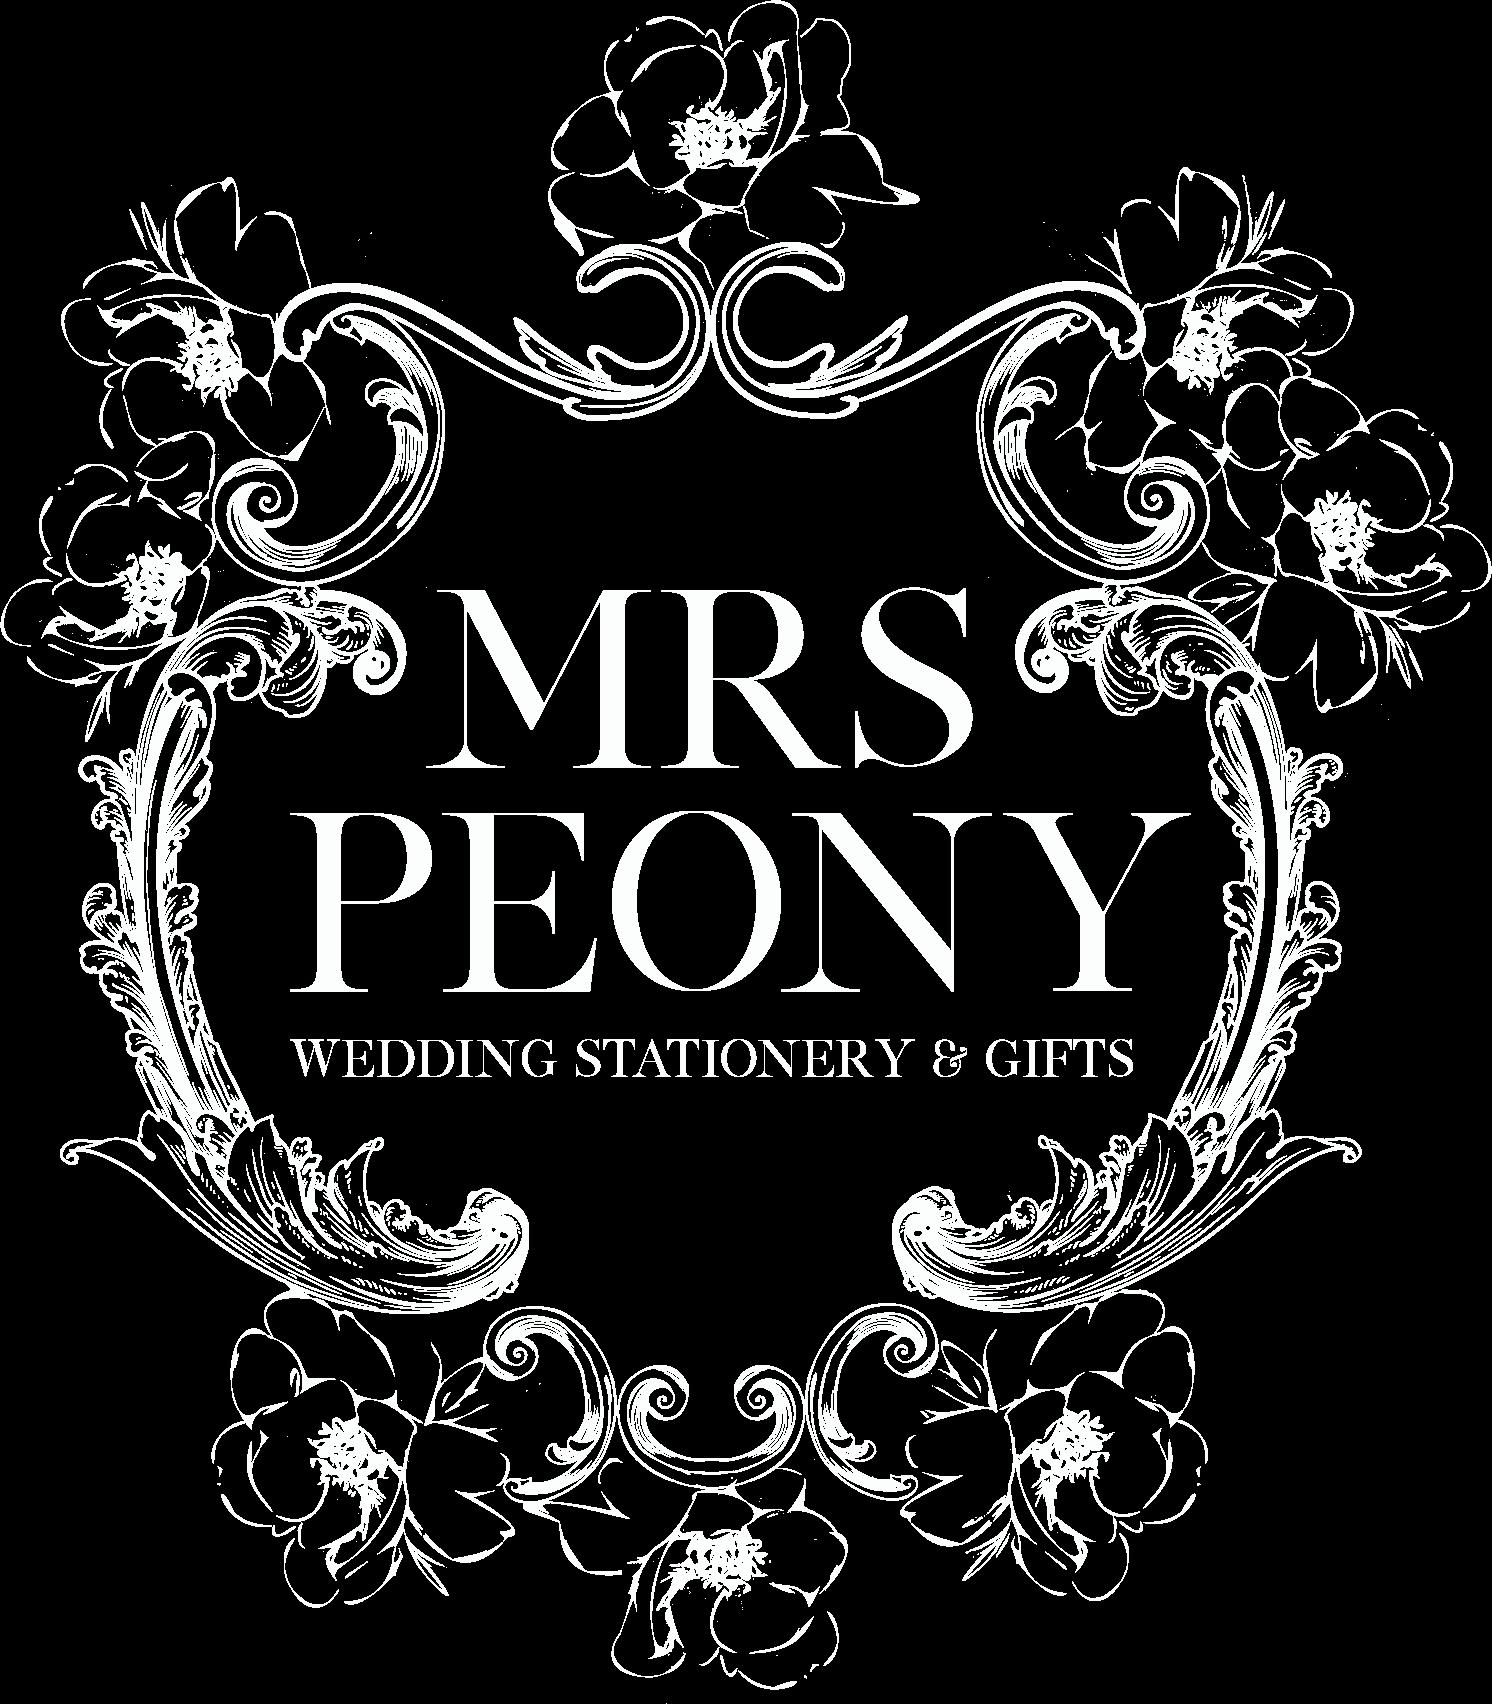 Mrs Peony